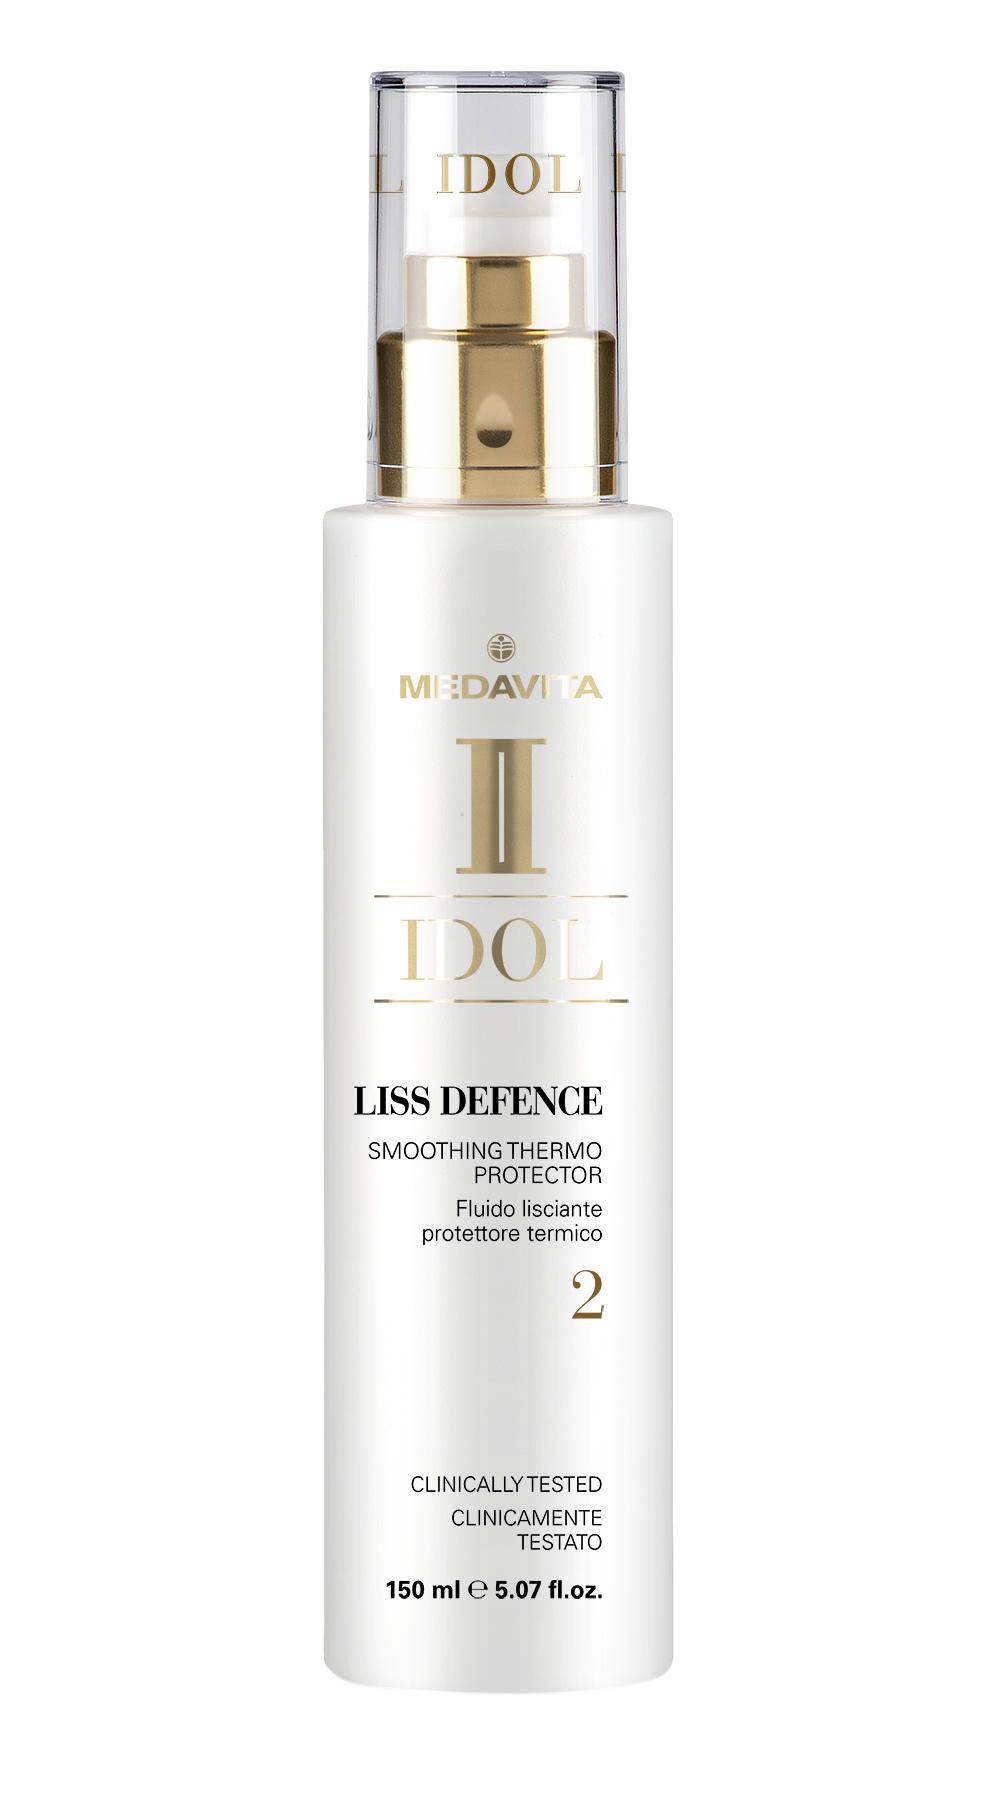 LissDefence IDOL 150ml-klein